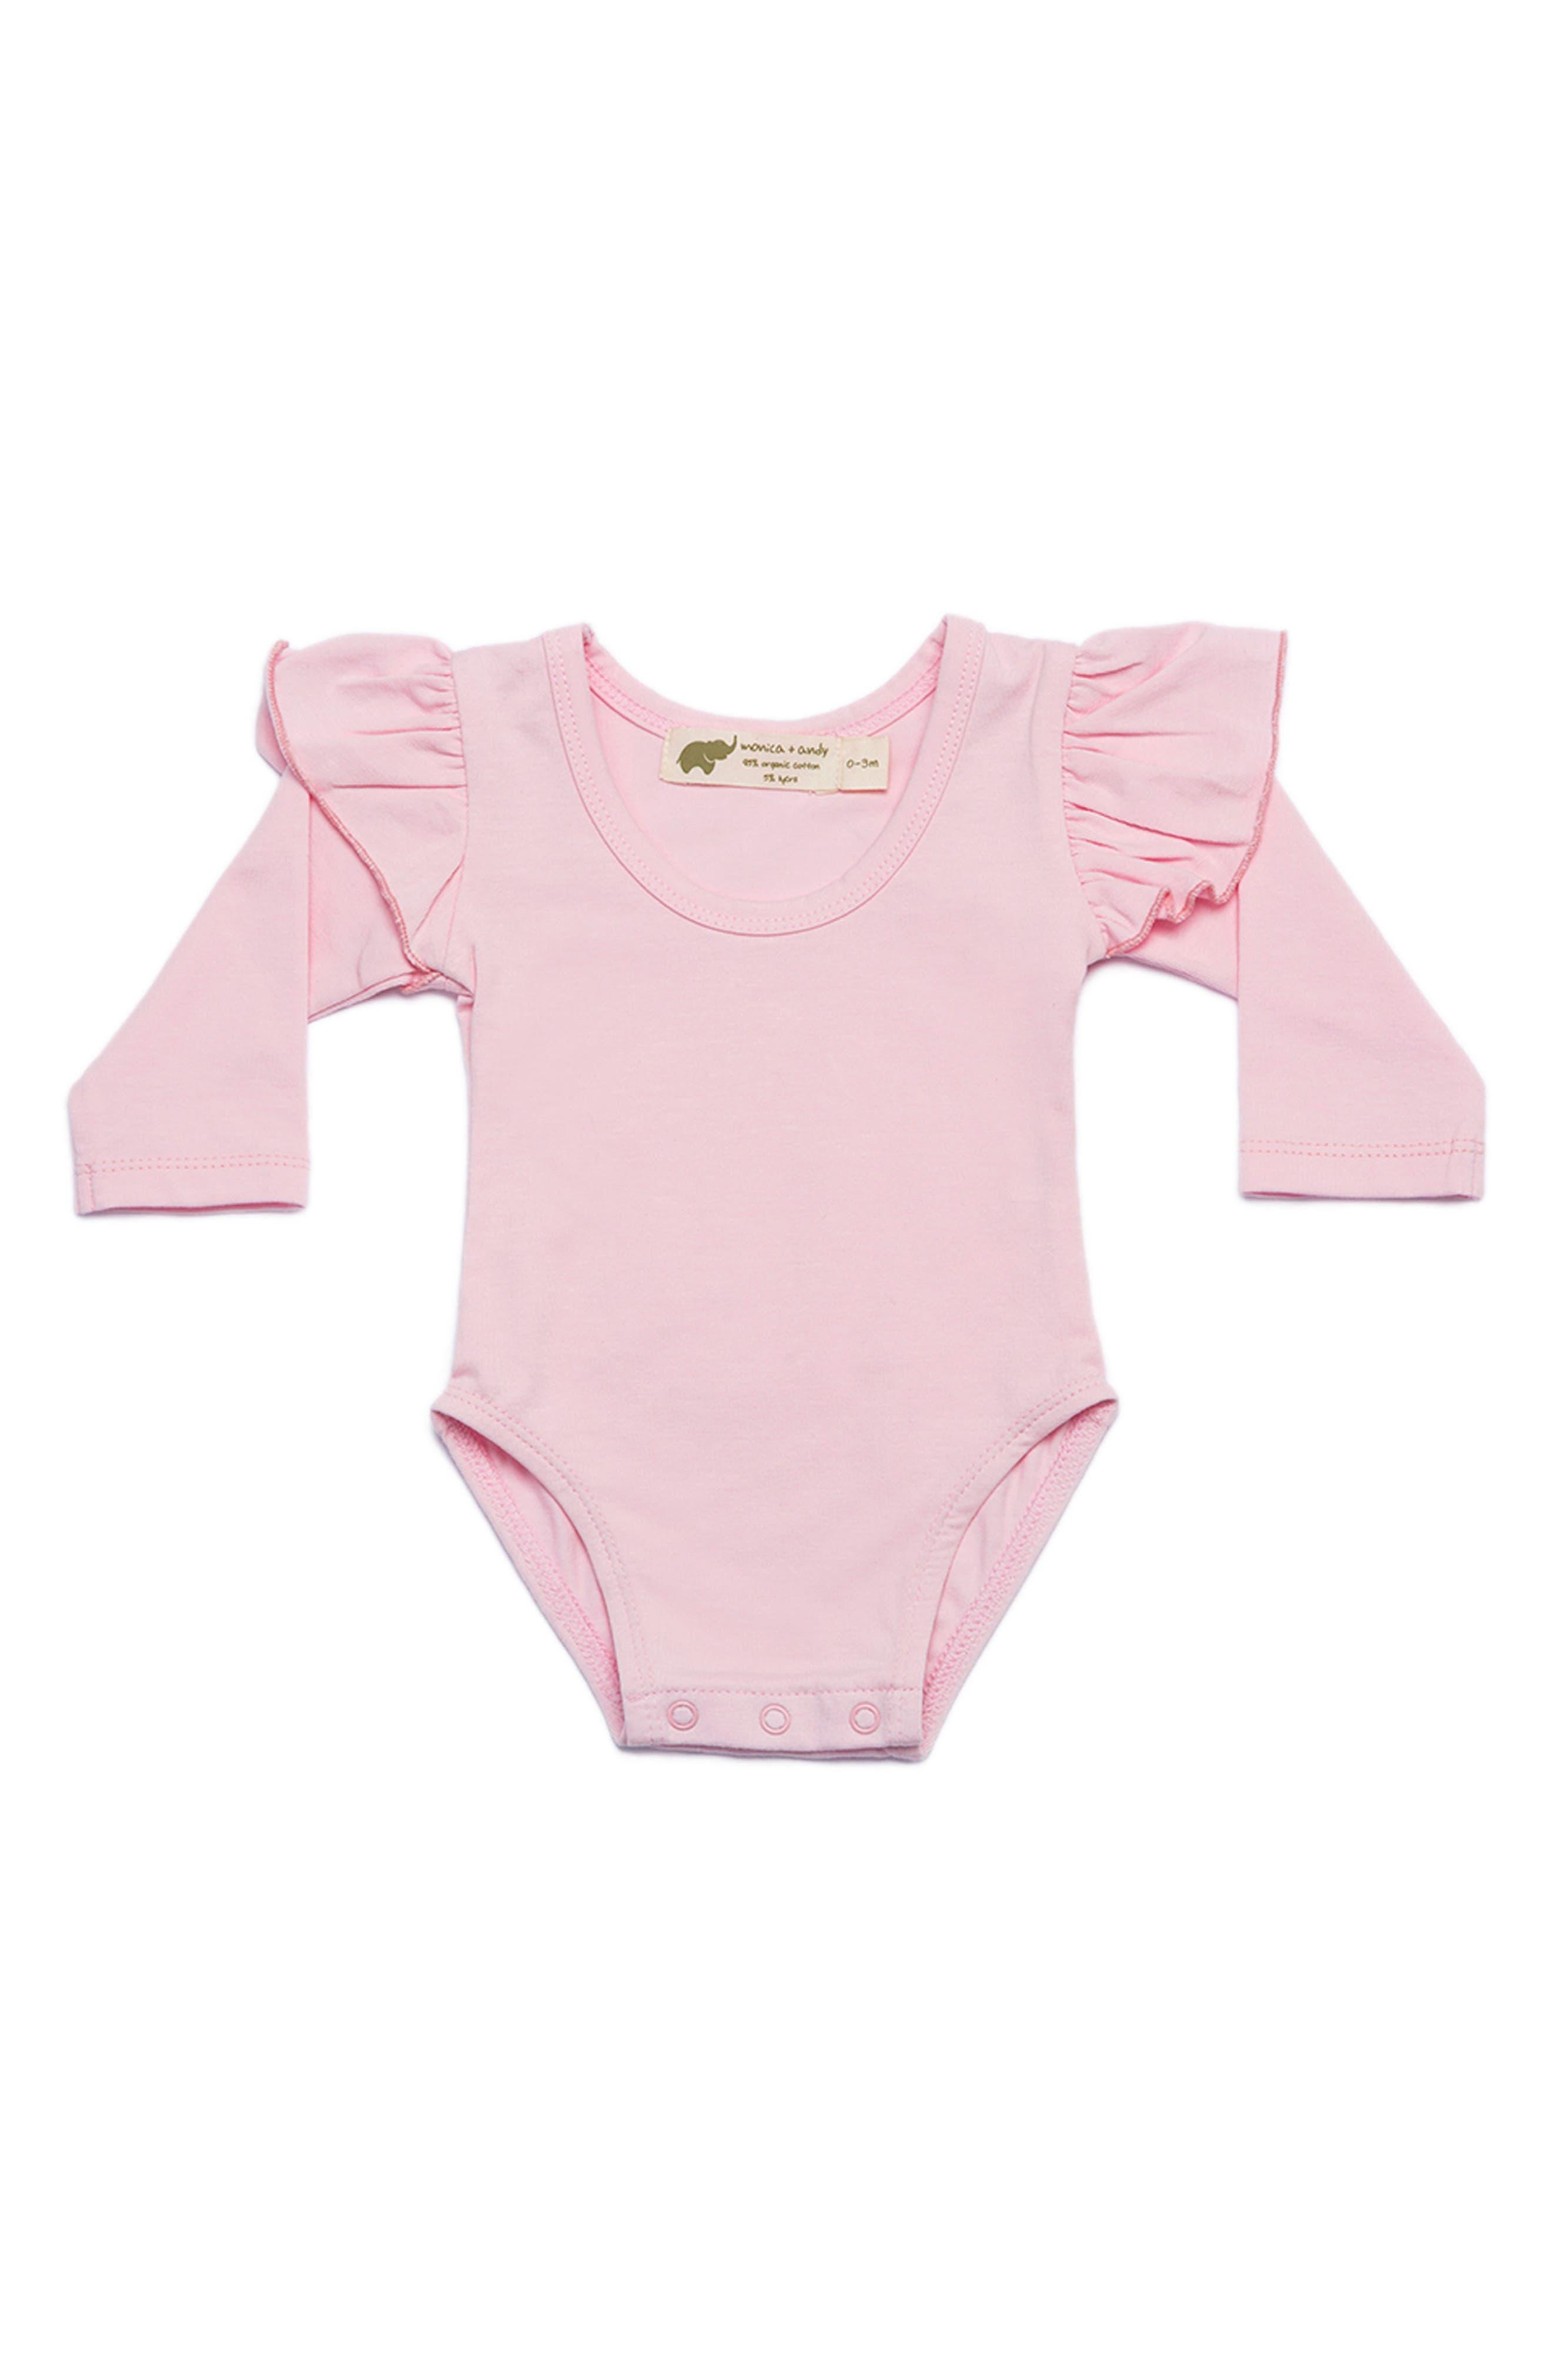 Main Image - Monica + Andy Double Ruffle Bodysuit (Baby Girls)